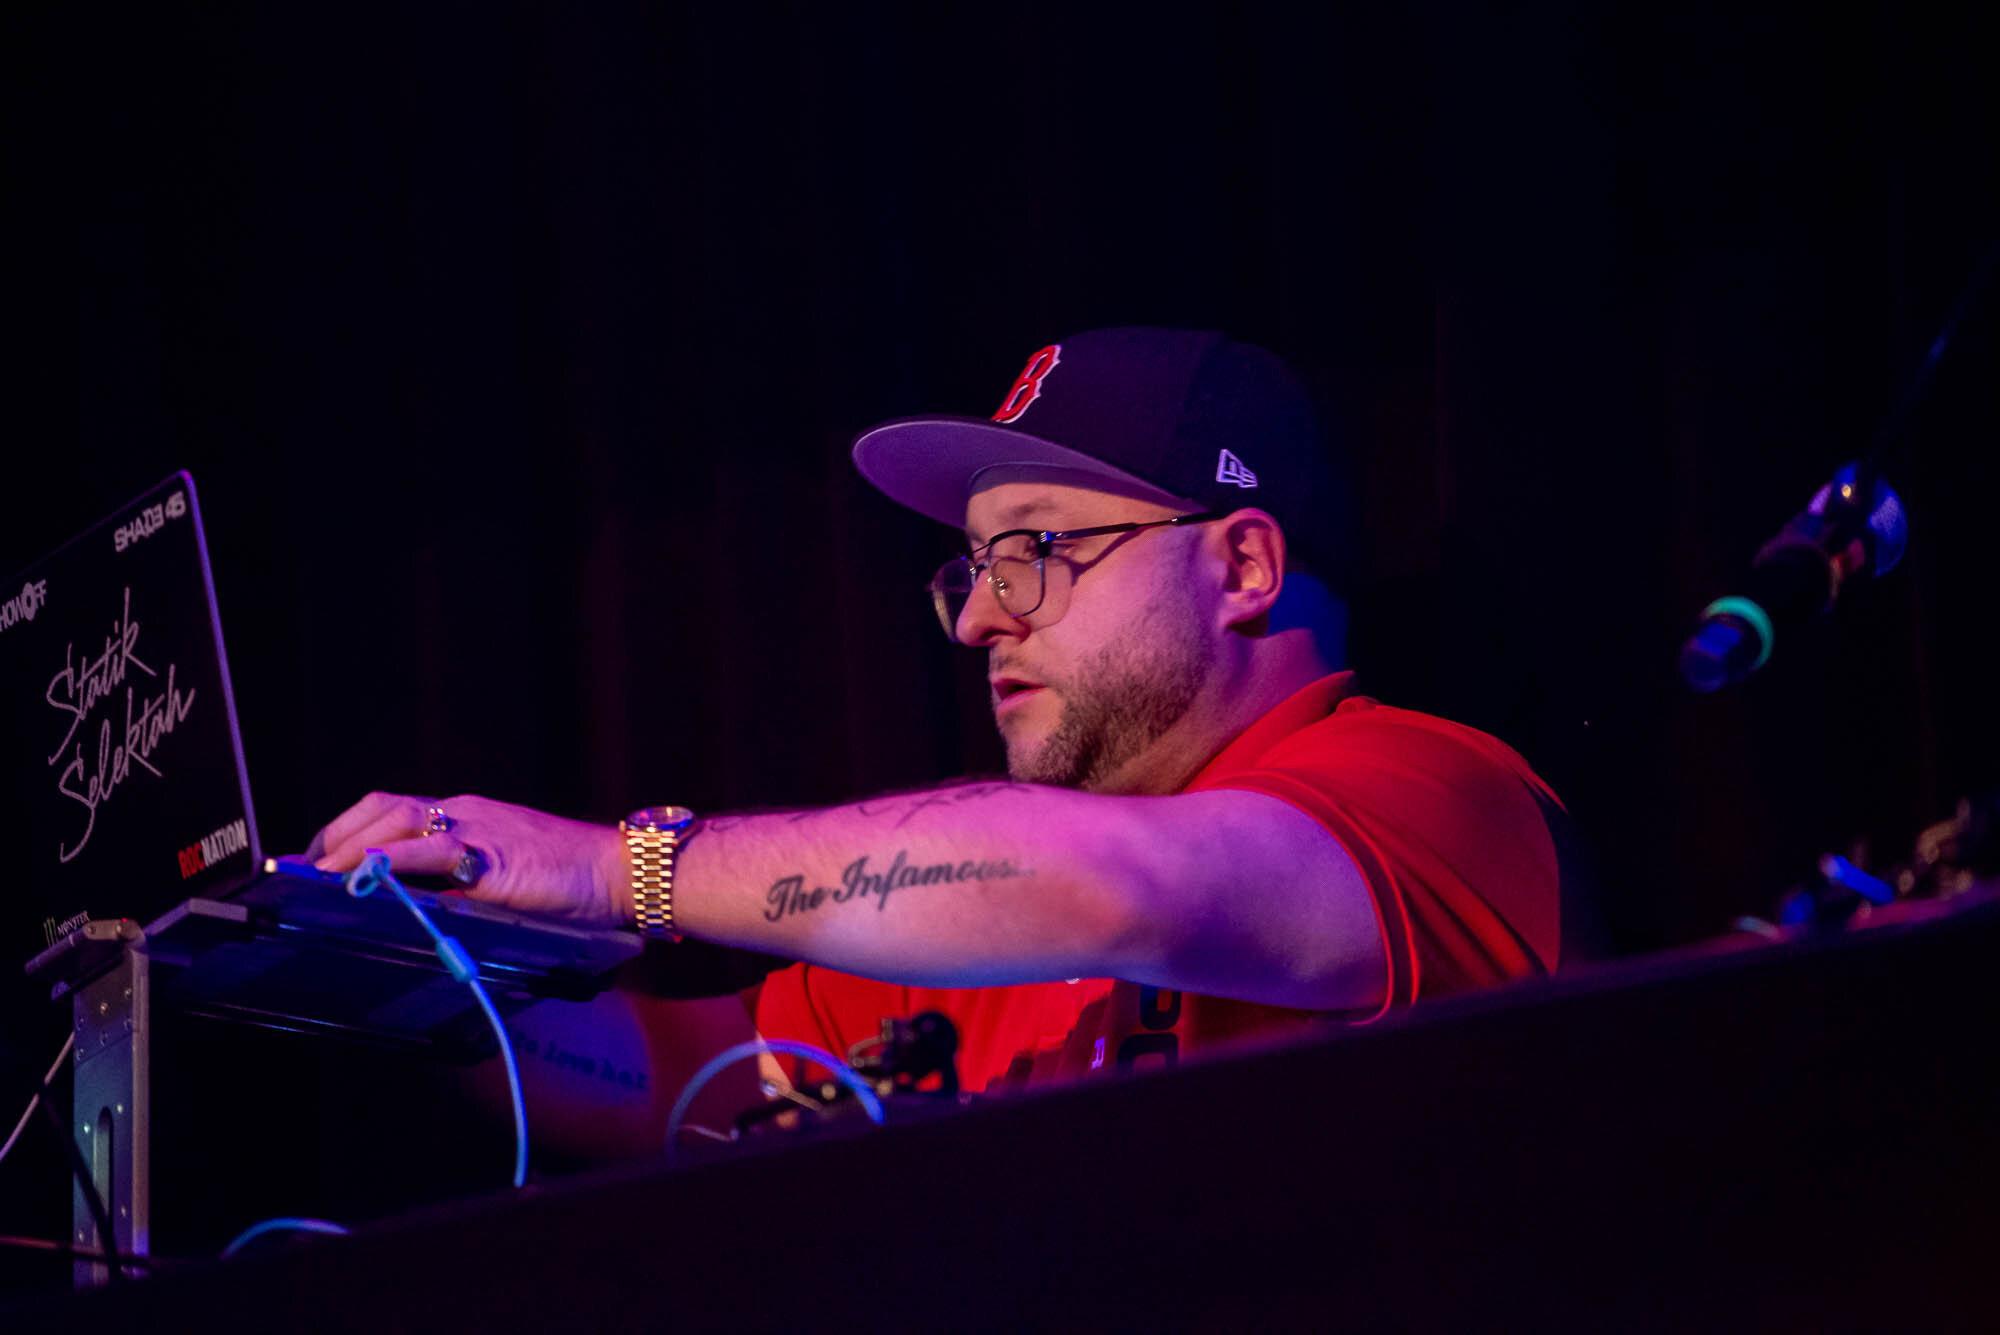 DJ Statik Selektah at Music Hall of Williamsburg on Monday, October 14, 2019.